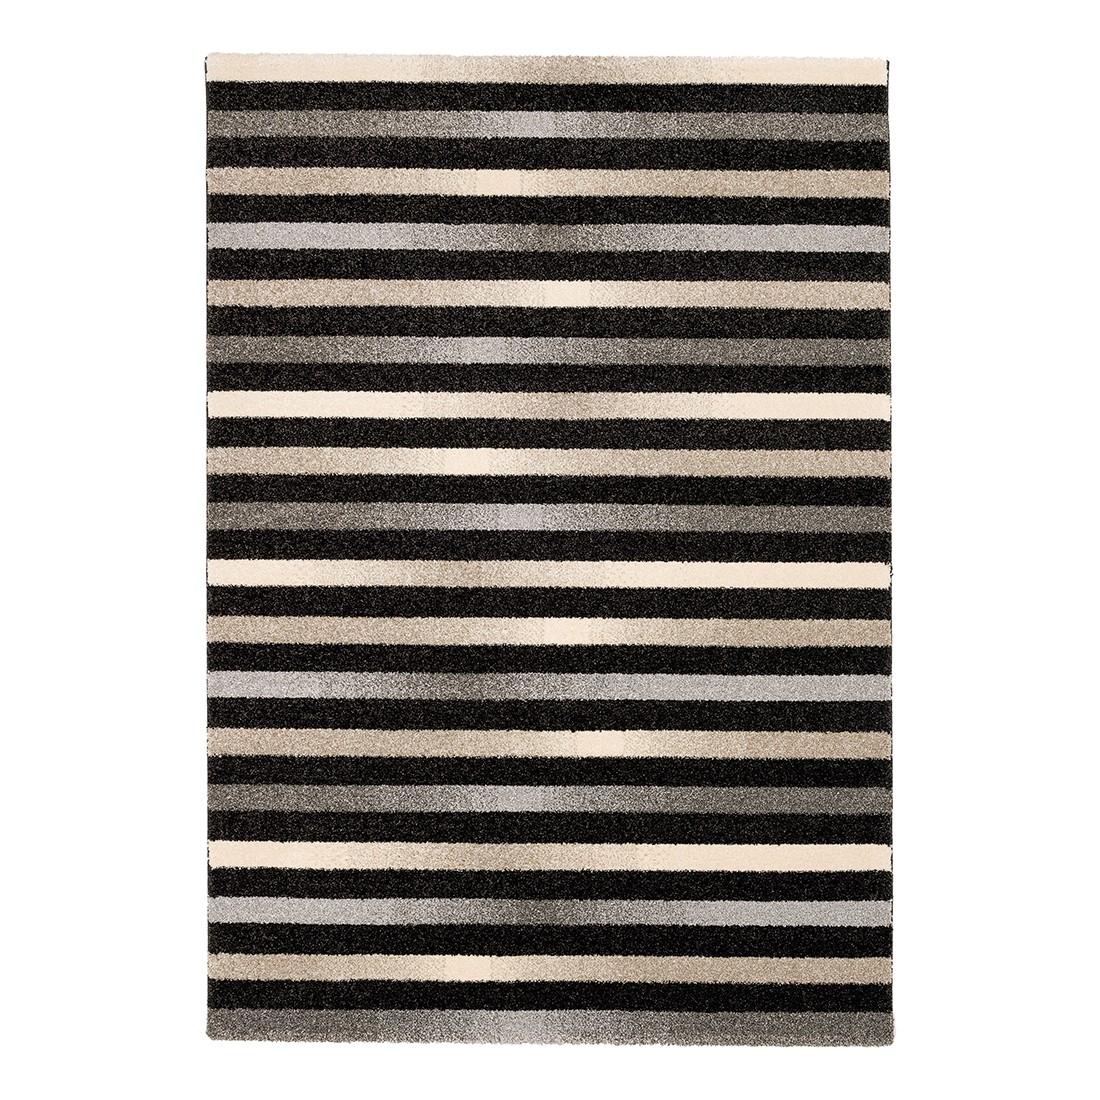 kurzflorteppiche archives. Black Bedroom Furniture Sets. Home Design Ideas